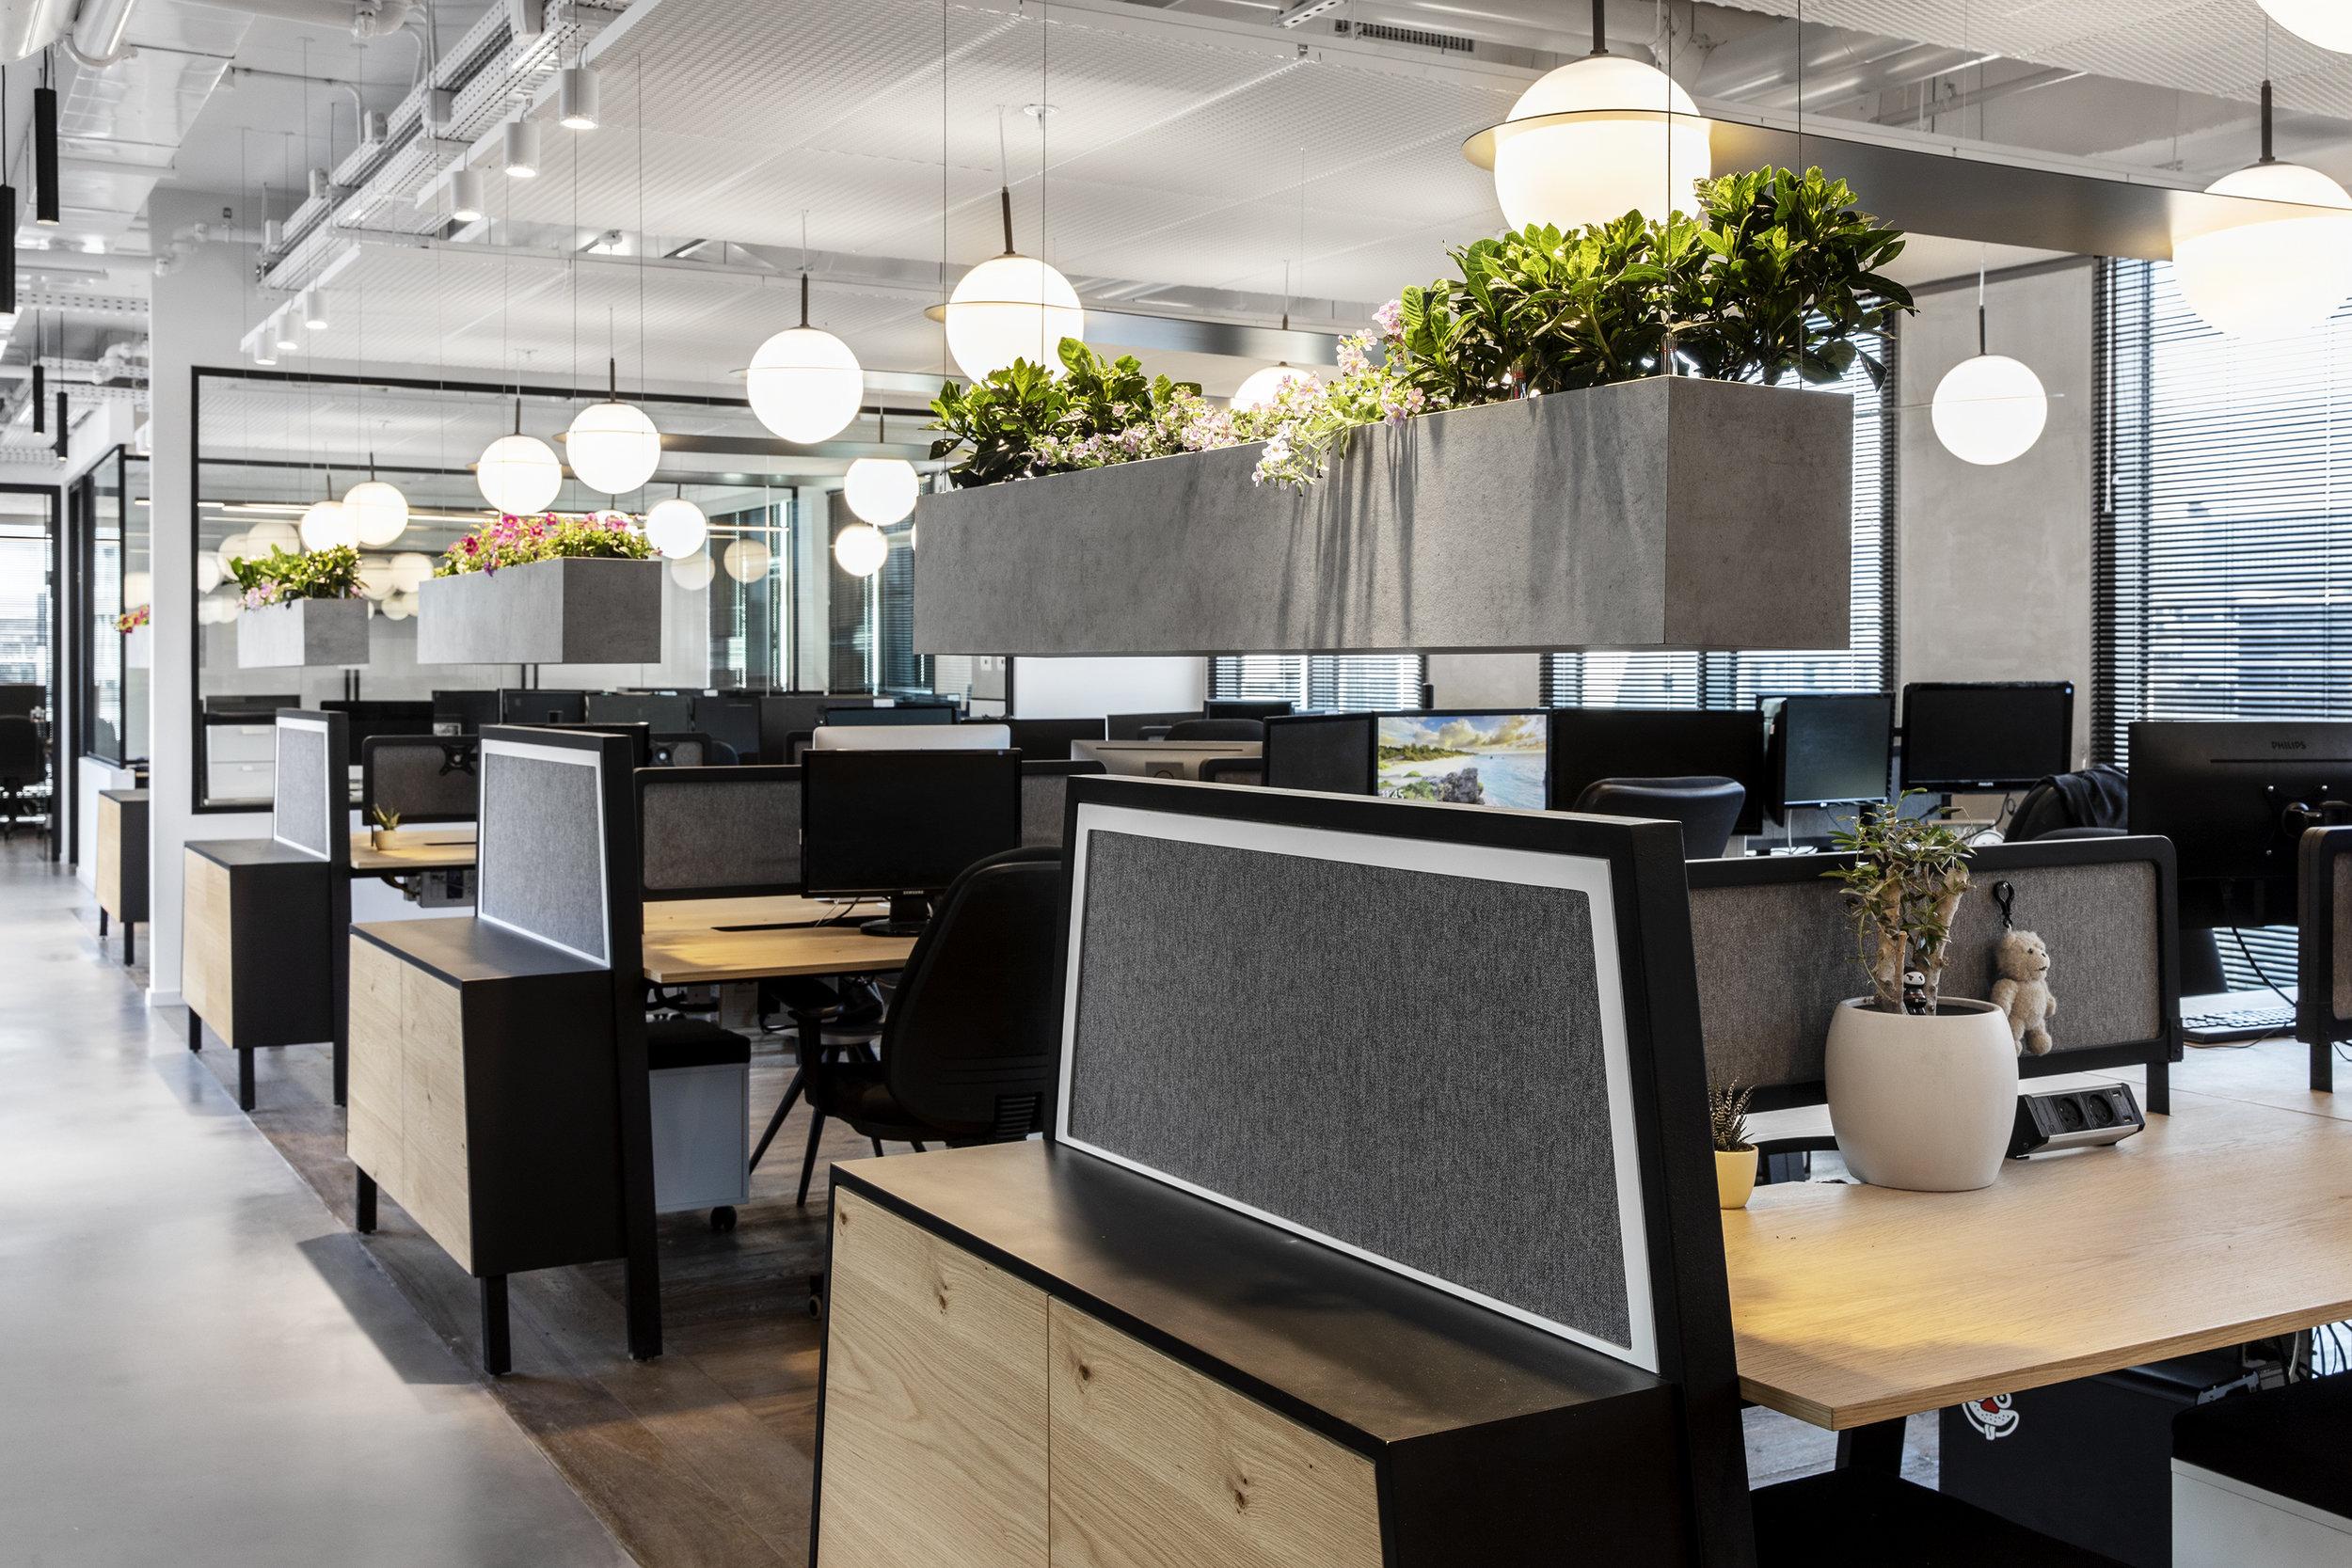 R2NET OFFICES - ROY DAVID ARCHITECTURE  STUDIO - רואי דוד אדריכלות סטודיו אדריכלים - אר2נט (19).jpg